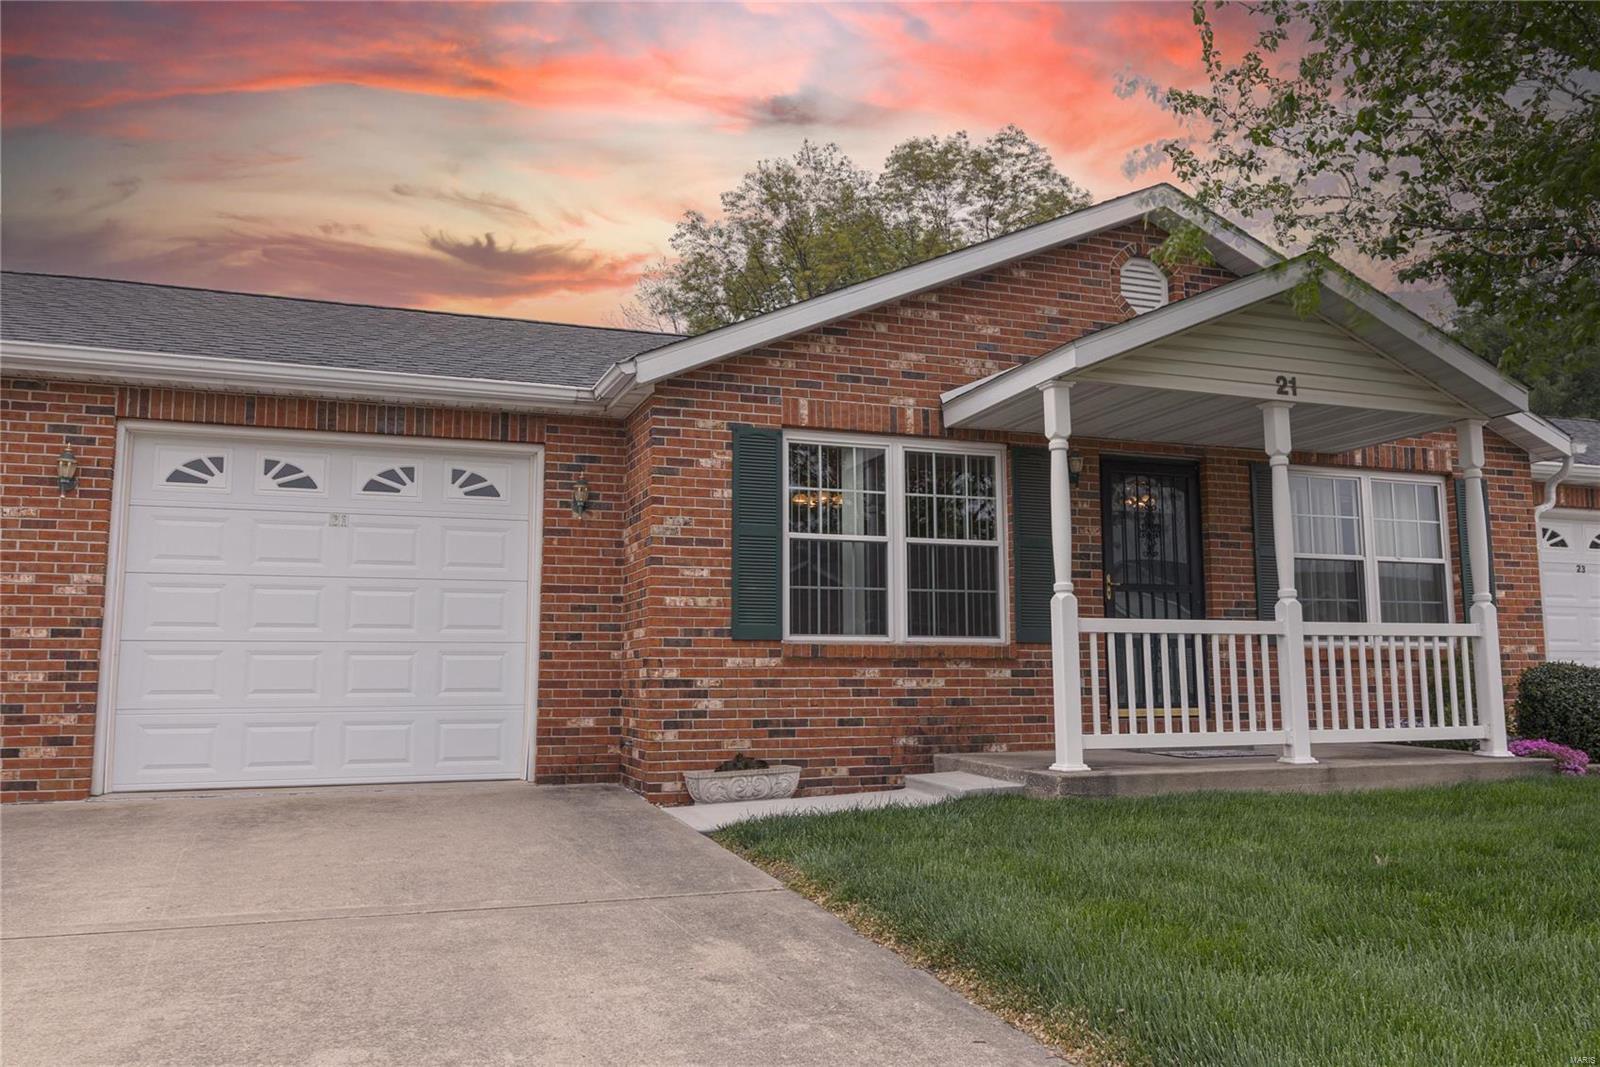 21 Parkside Drive Property Photo - Bethalto, IL real estate listing